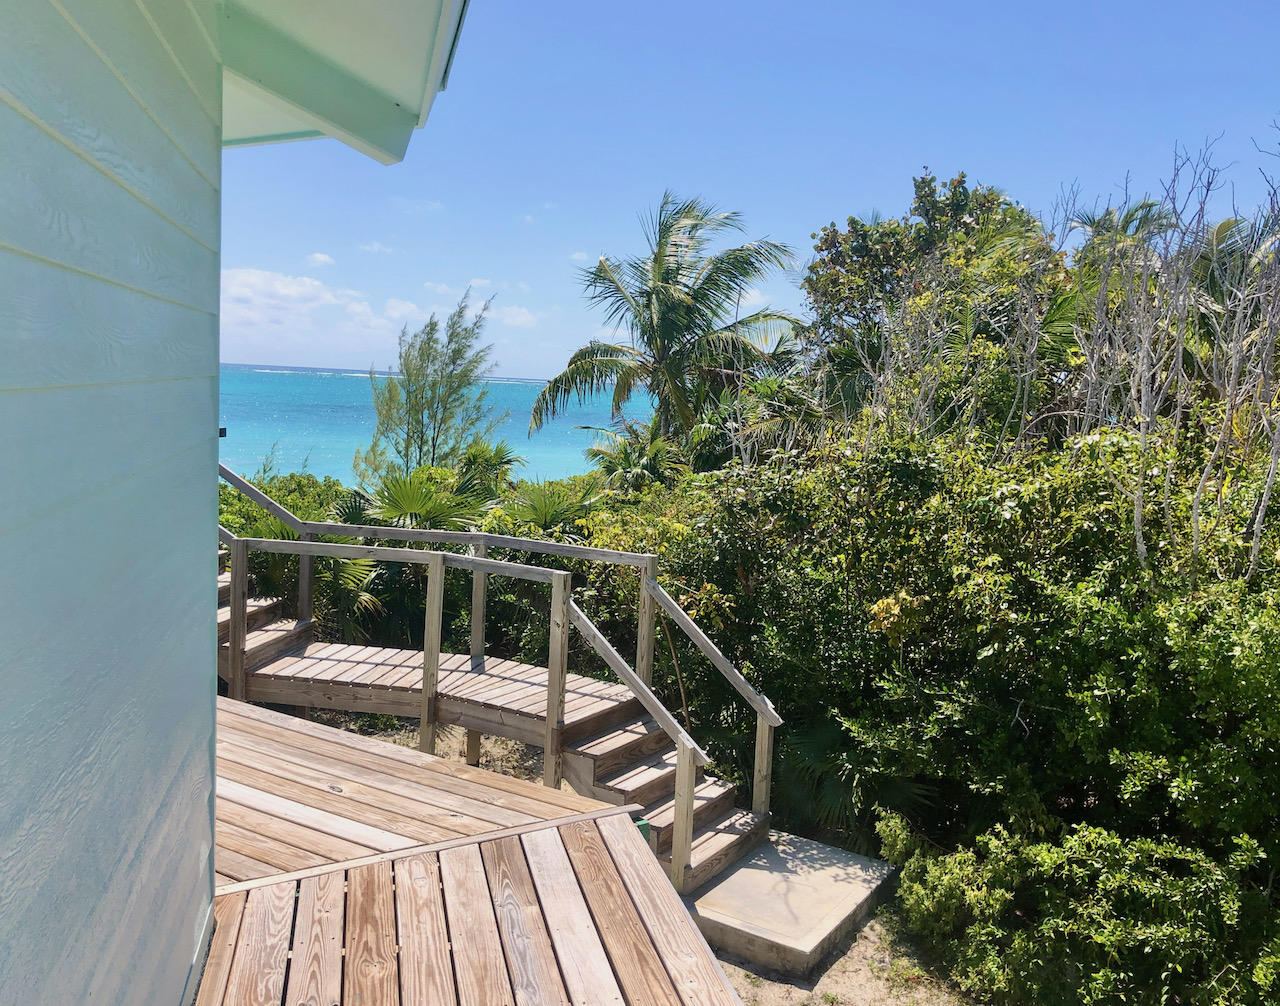 bahama-palm-shores-beachfront-home-for-sale-9